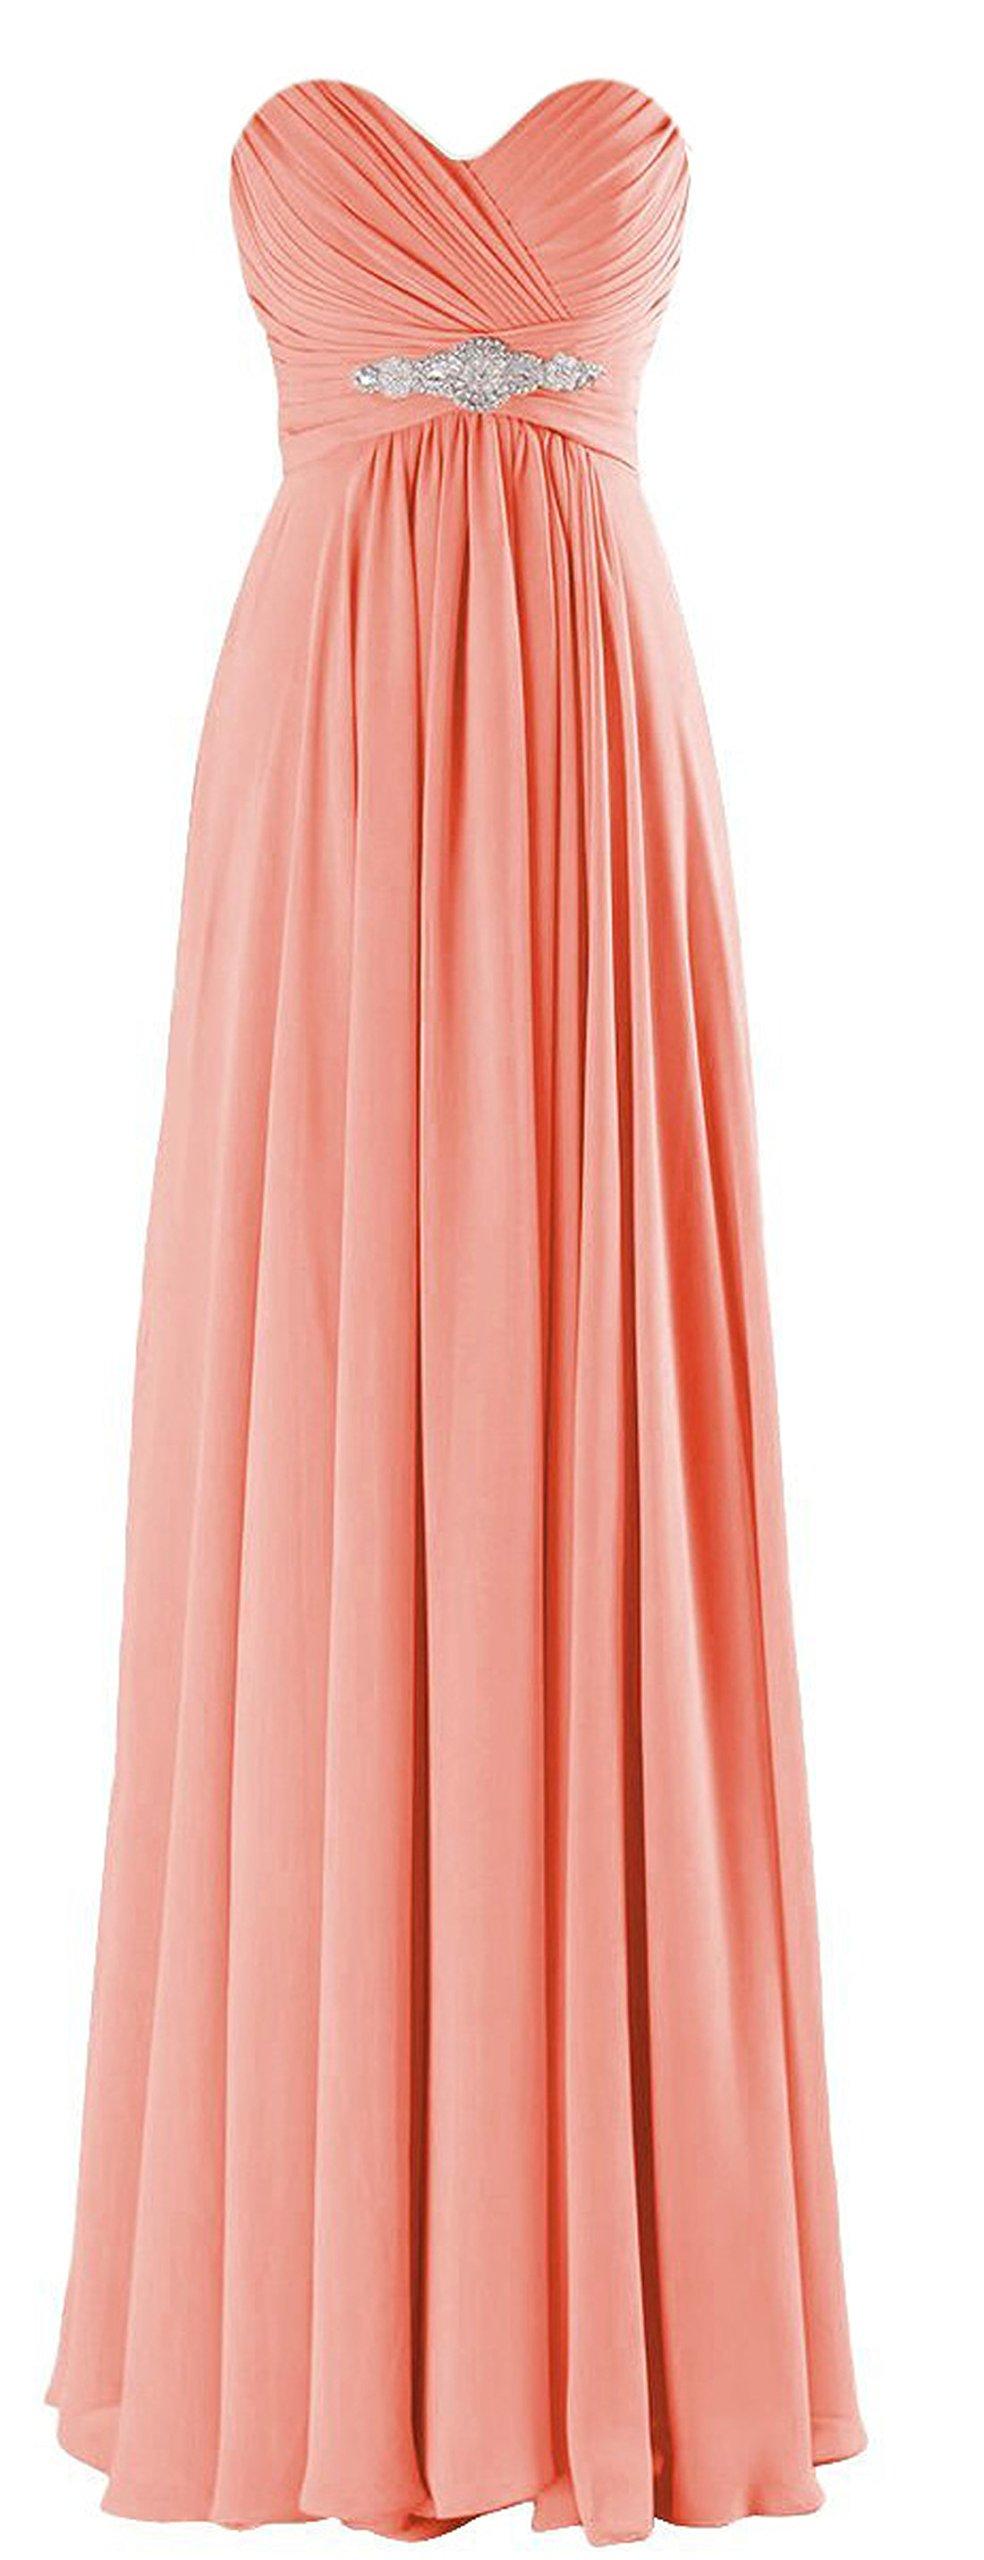 ThaliaDress Long Chiffon Sweetheart Evening Bridesmaid Dresses Prom Gowns T002LF Peach US22W